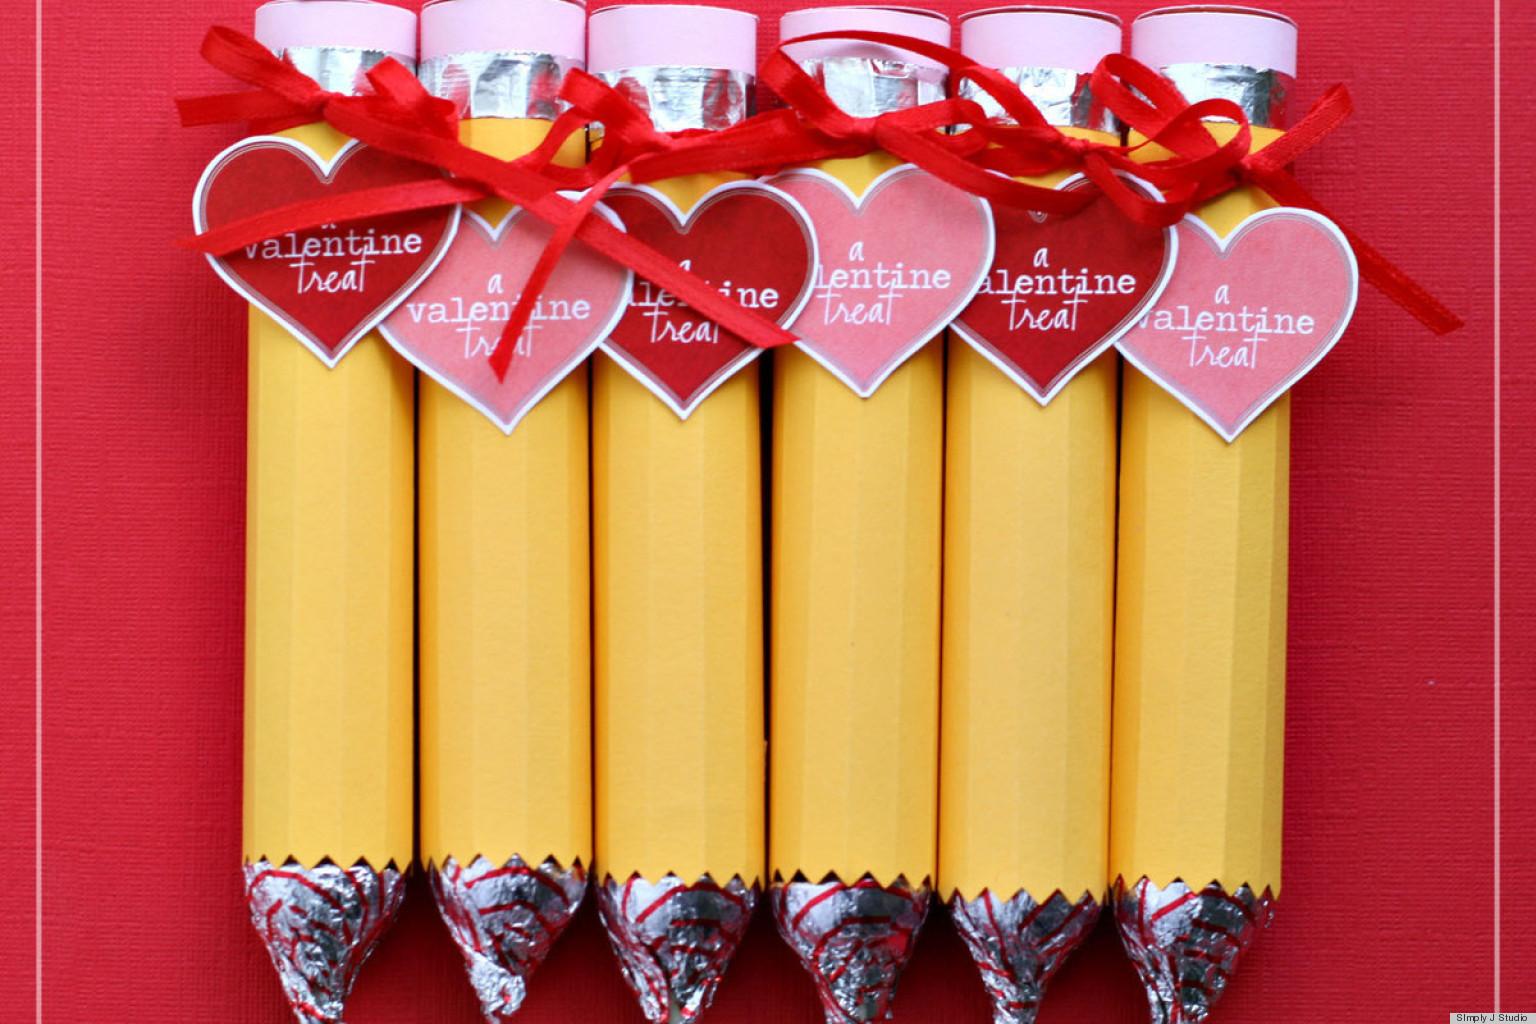 Valentines Day Kid Crafts That Even Grown Ups Will Love